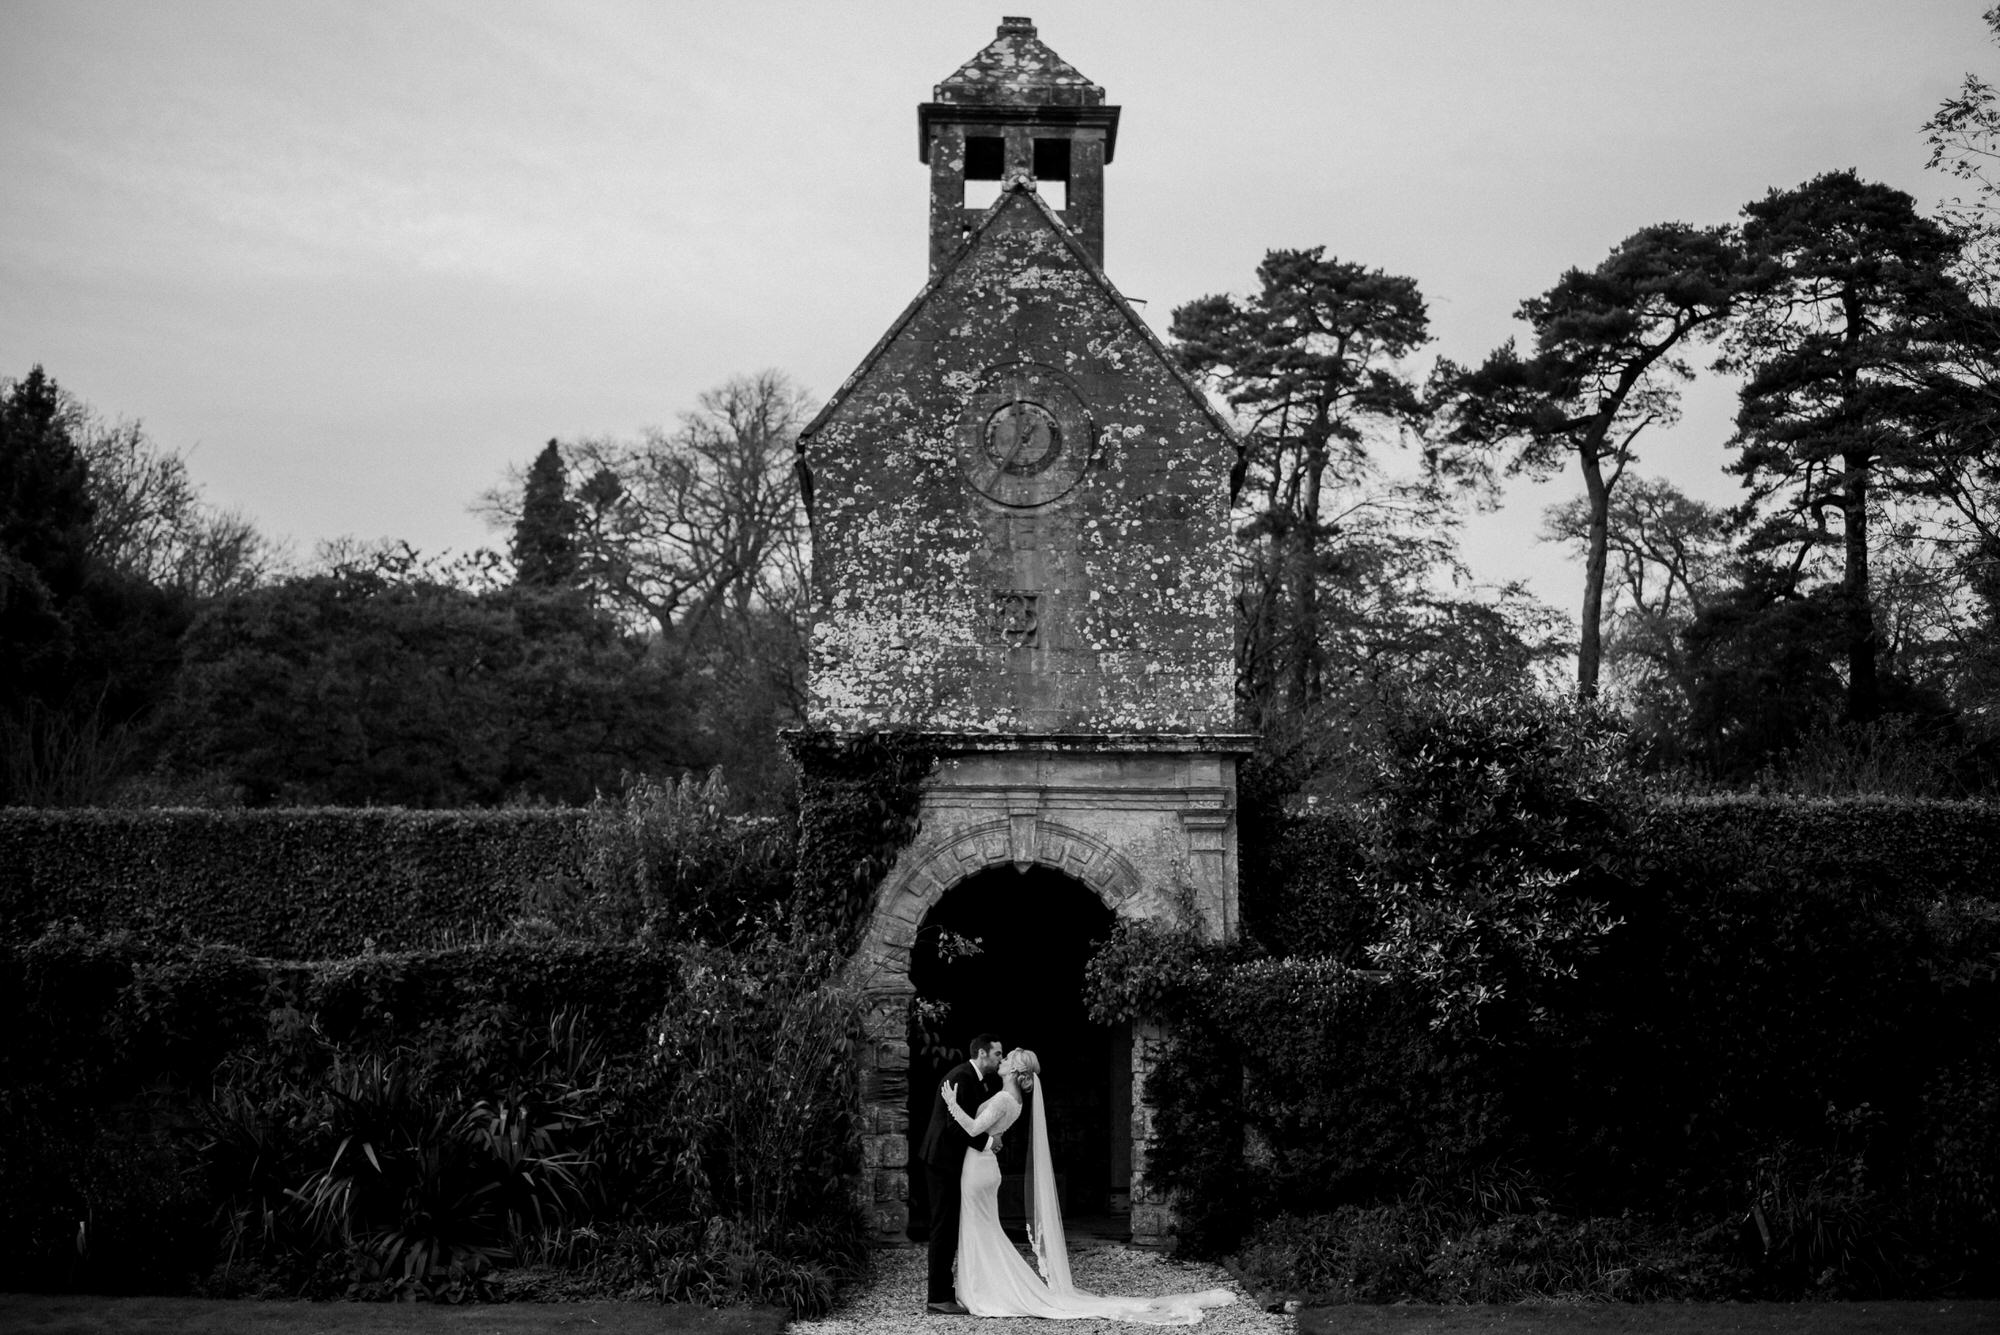 Wedding photographer Brympton house Somerset